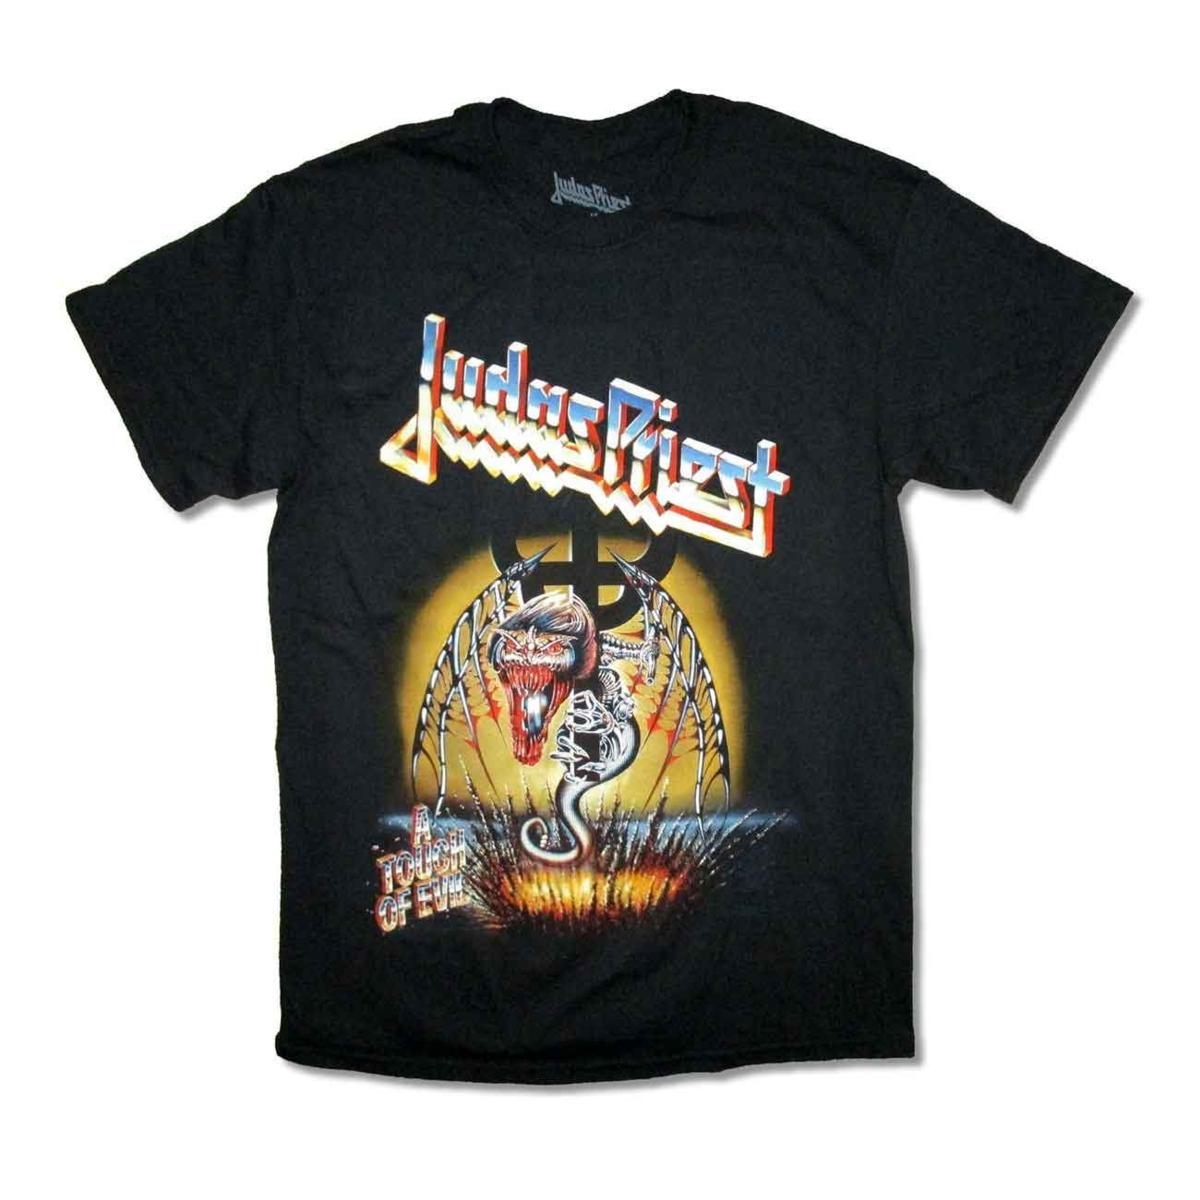 Judas Priest バンドTシャツ ジューダス・プリースト A Touch Of Evil S